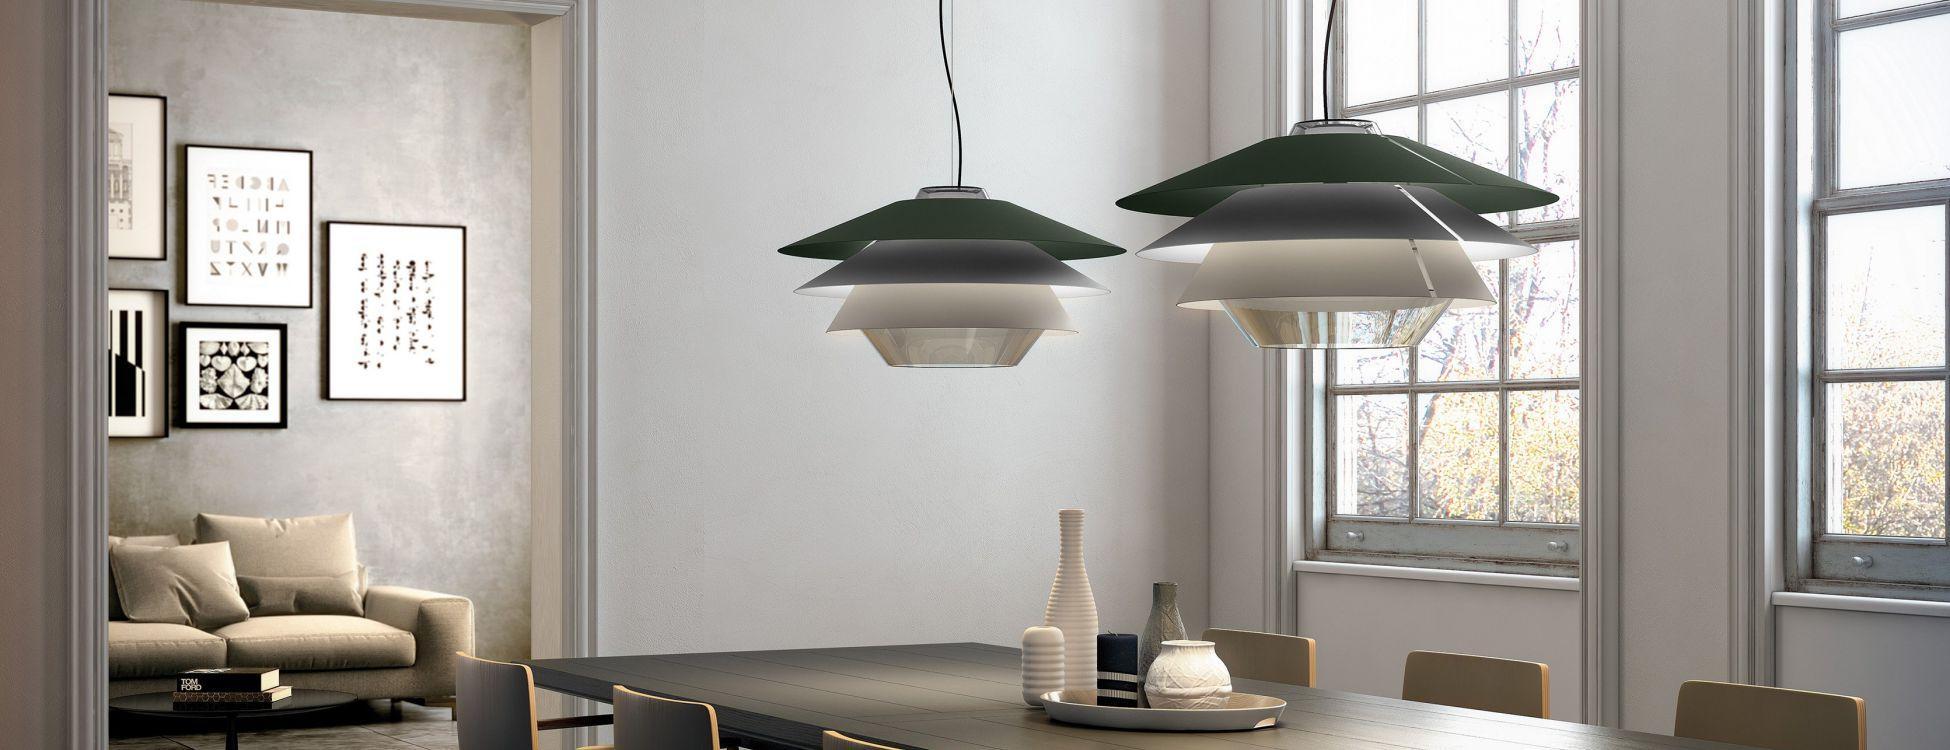 Overlay S25 Lampe Pendelleuchte G9 60W - Glas Grau